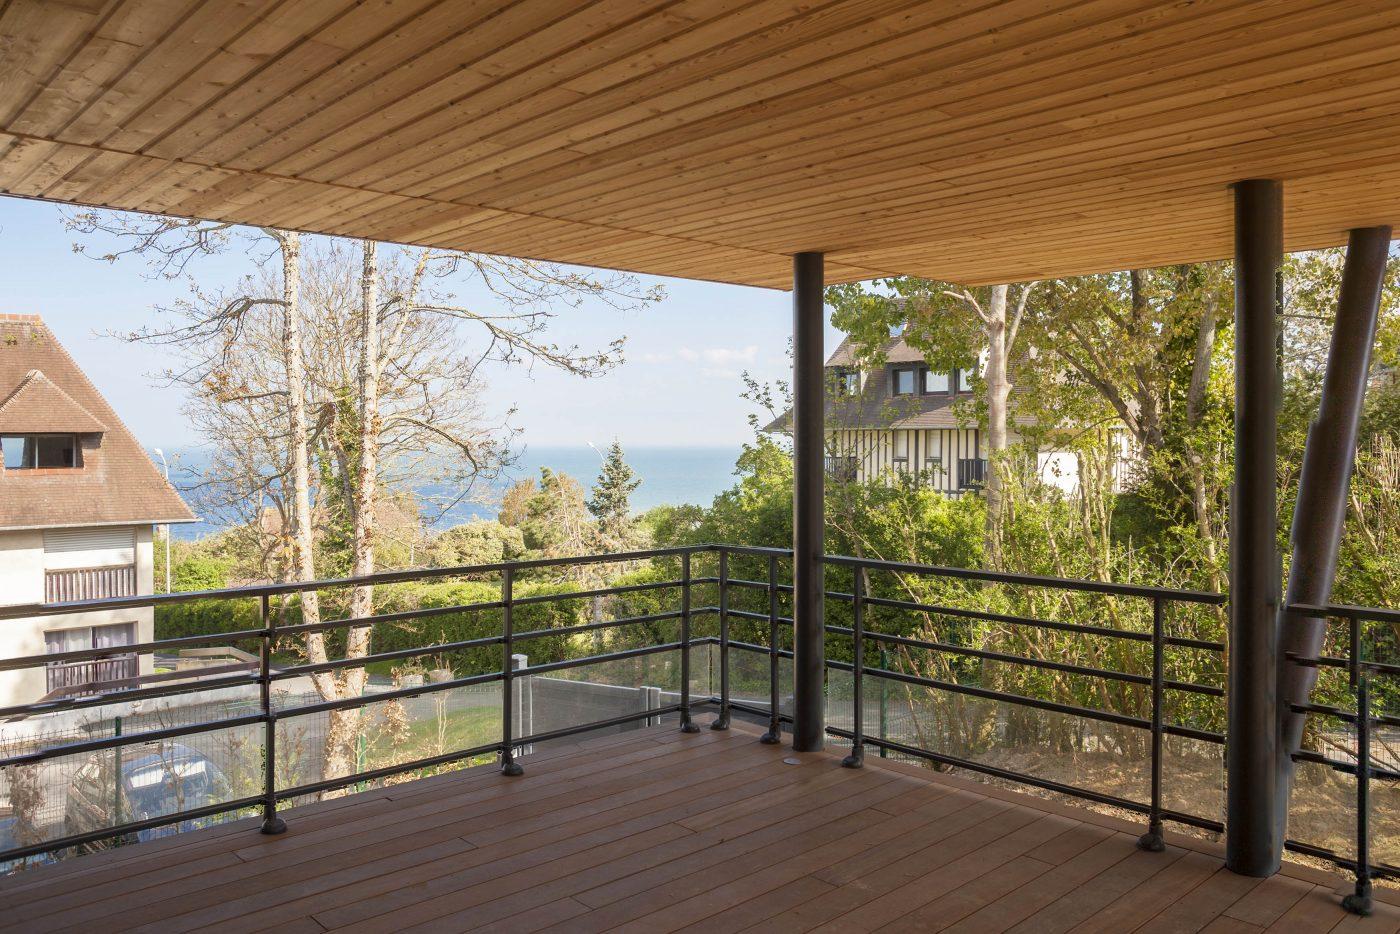 Philippe_Zerbib_Architecte_construction_maisons_ossature_bois_projet_maison_benhamou_MG_8460-HDR